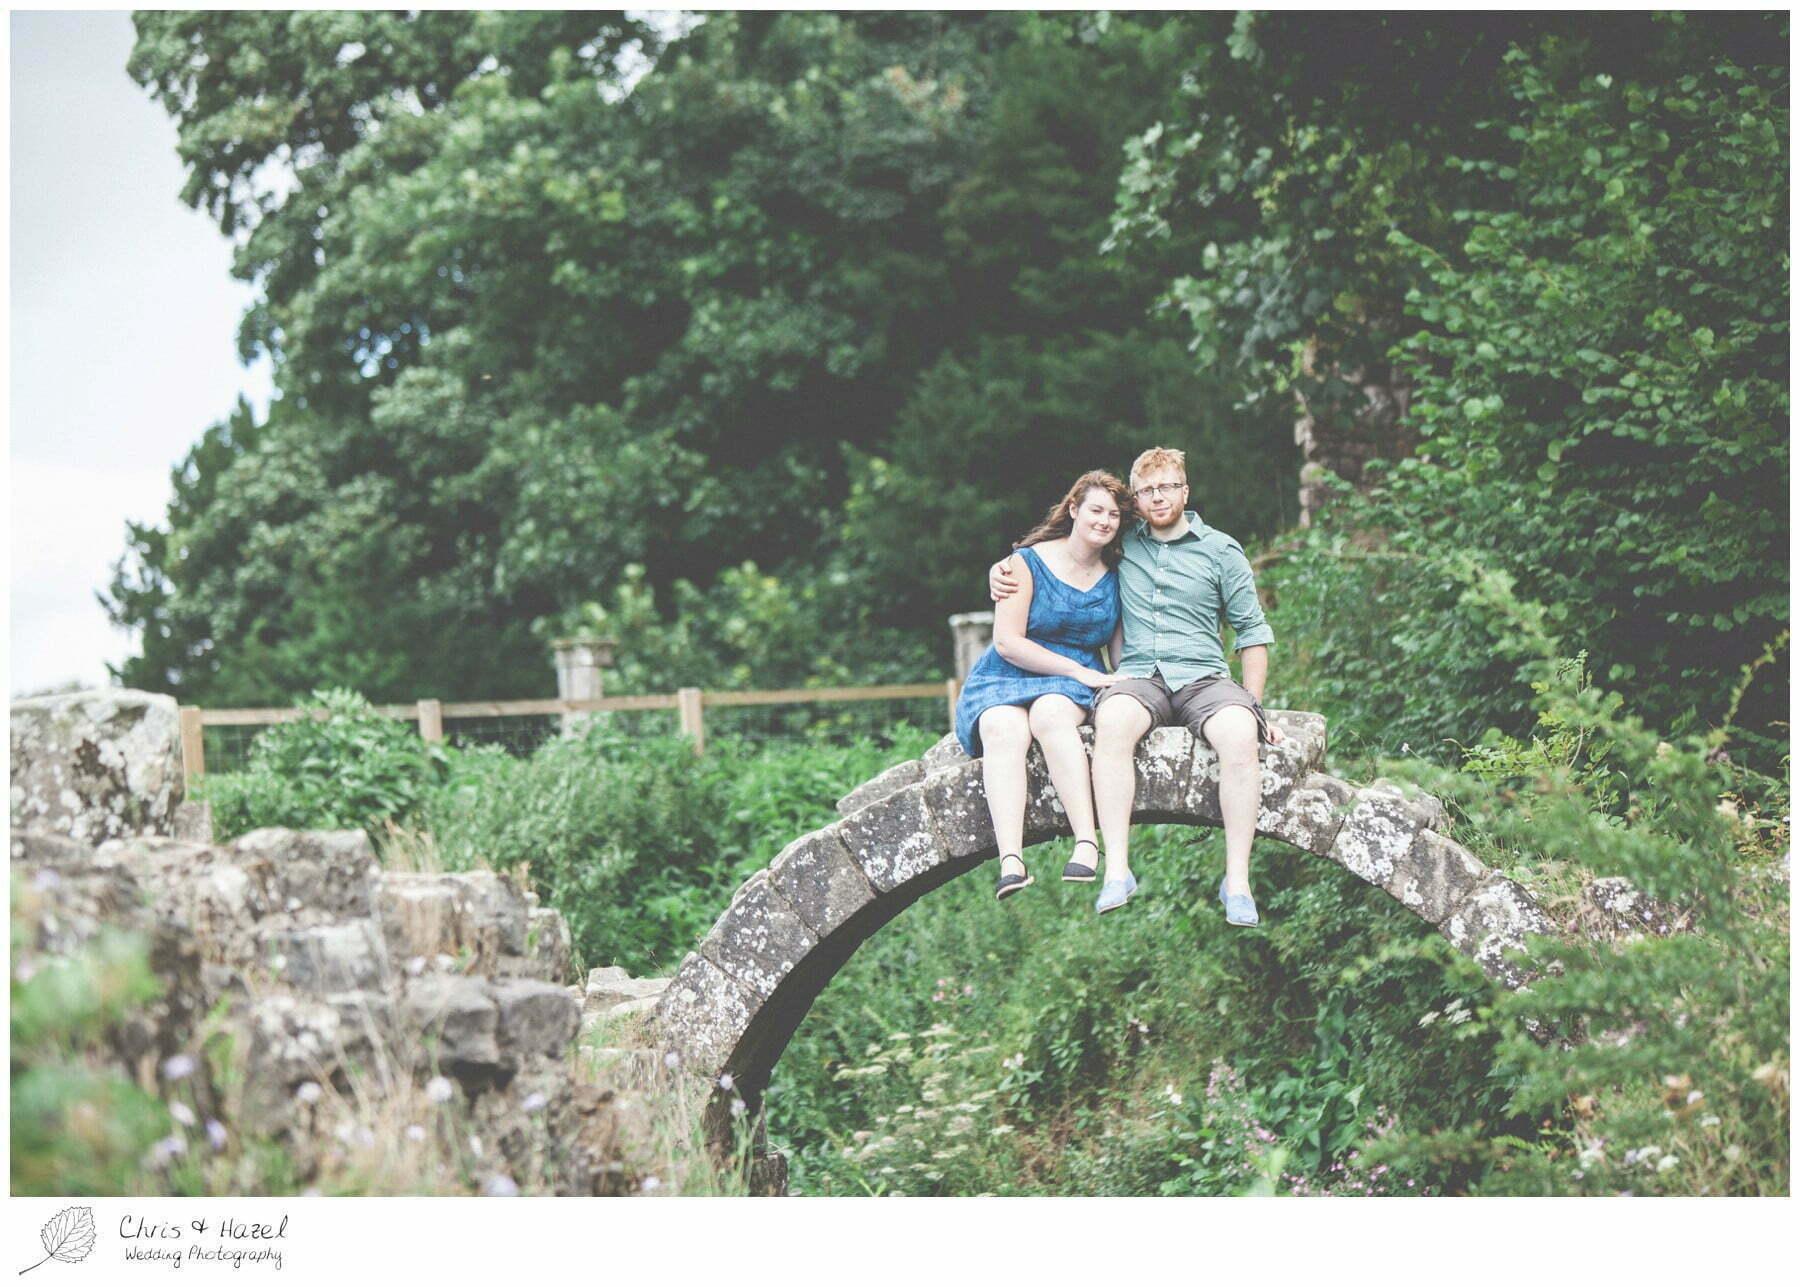 bridge, engagement, dogs, Fountains abbey national trust, Rippon, Fountains Abbey, Pre Wedding Photography Yorkshire, Chris and Hazel Wedding Photography, Sam Nicholson, Emily Nunwick,